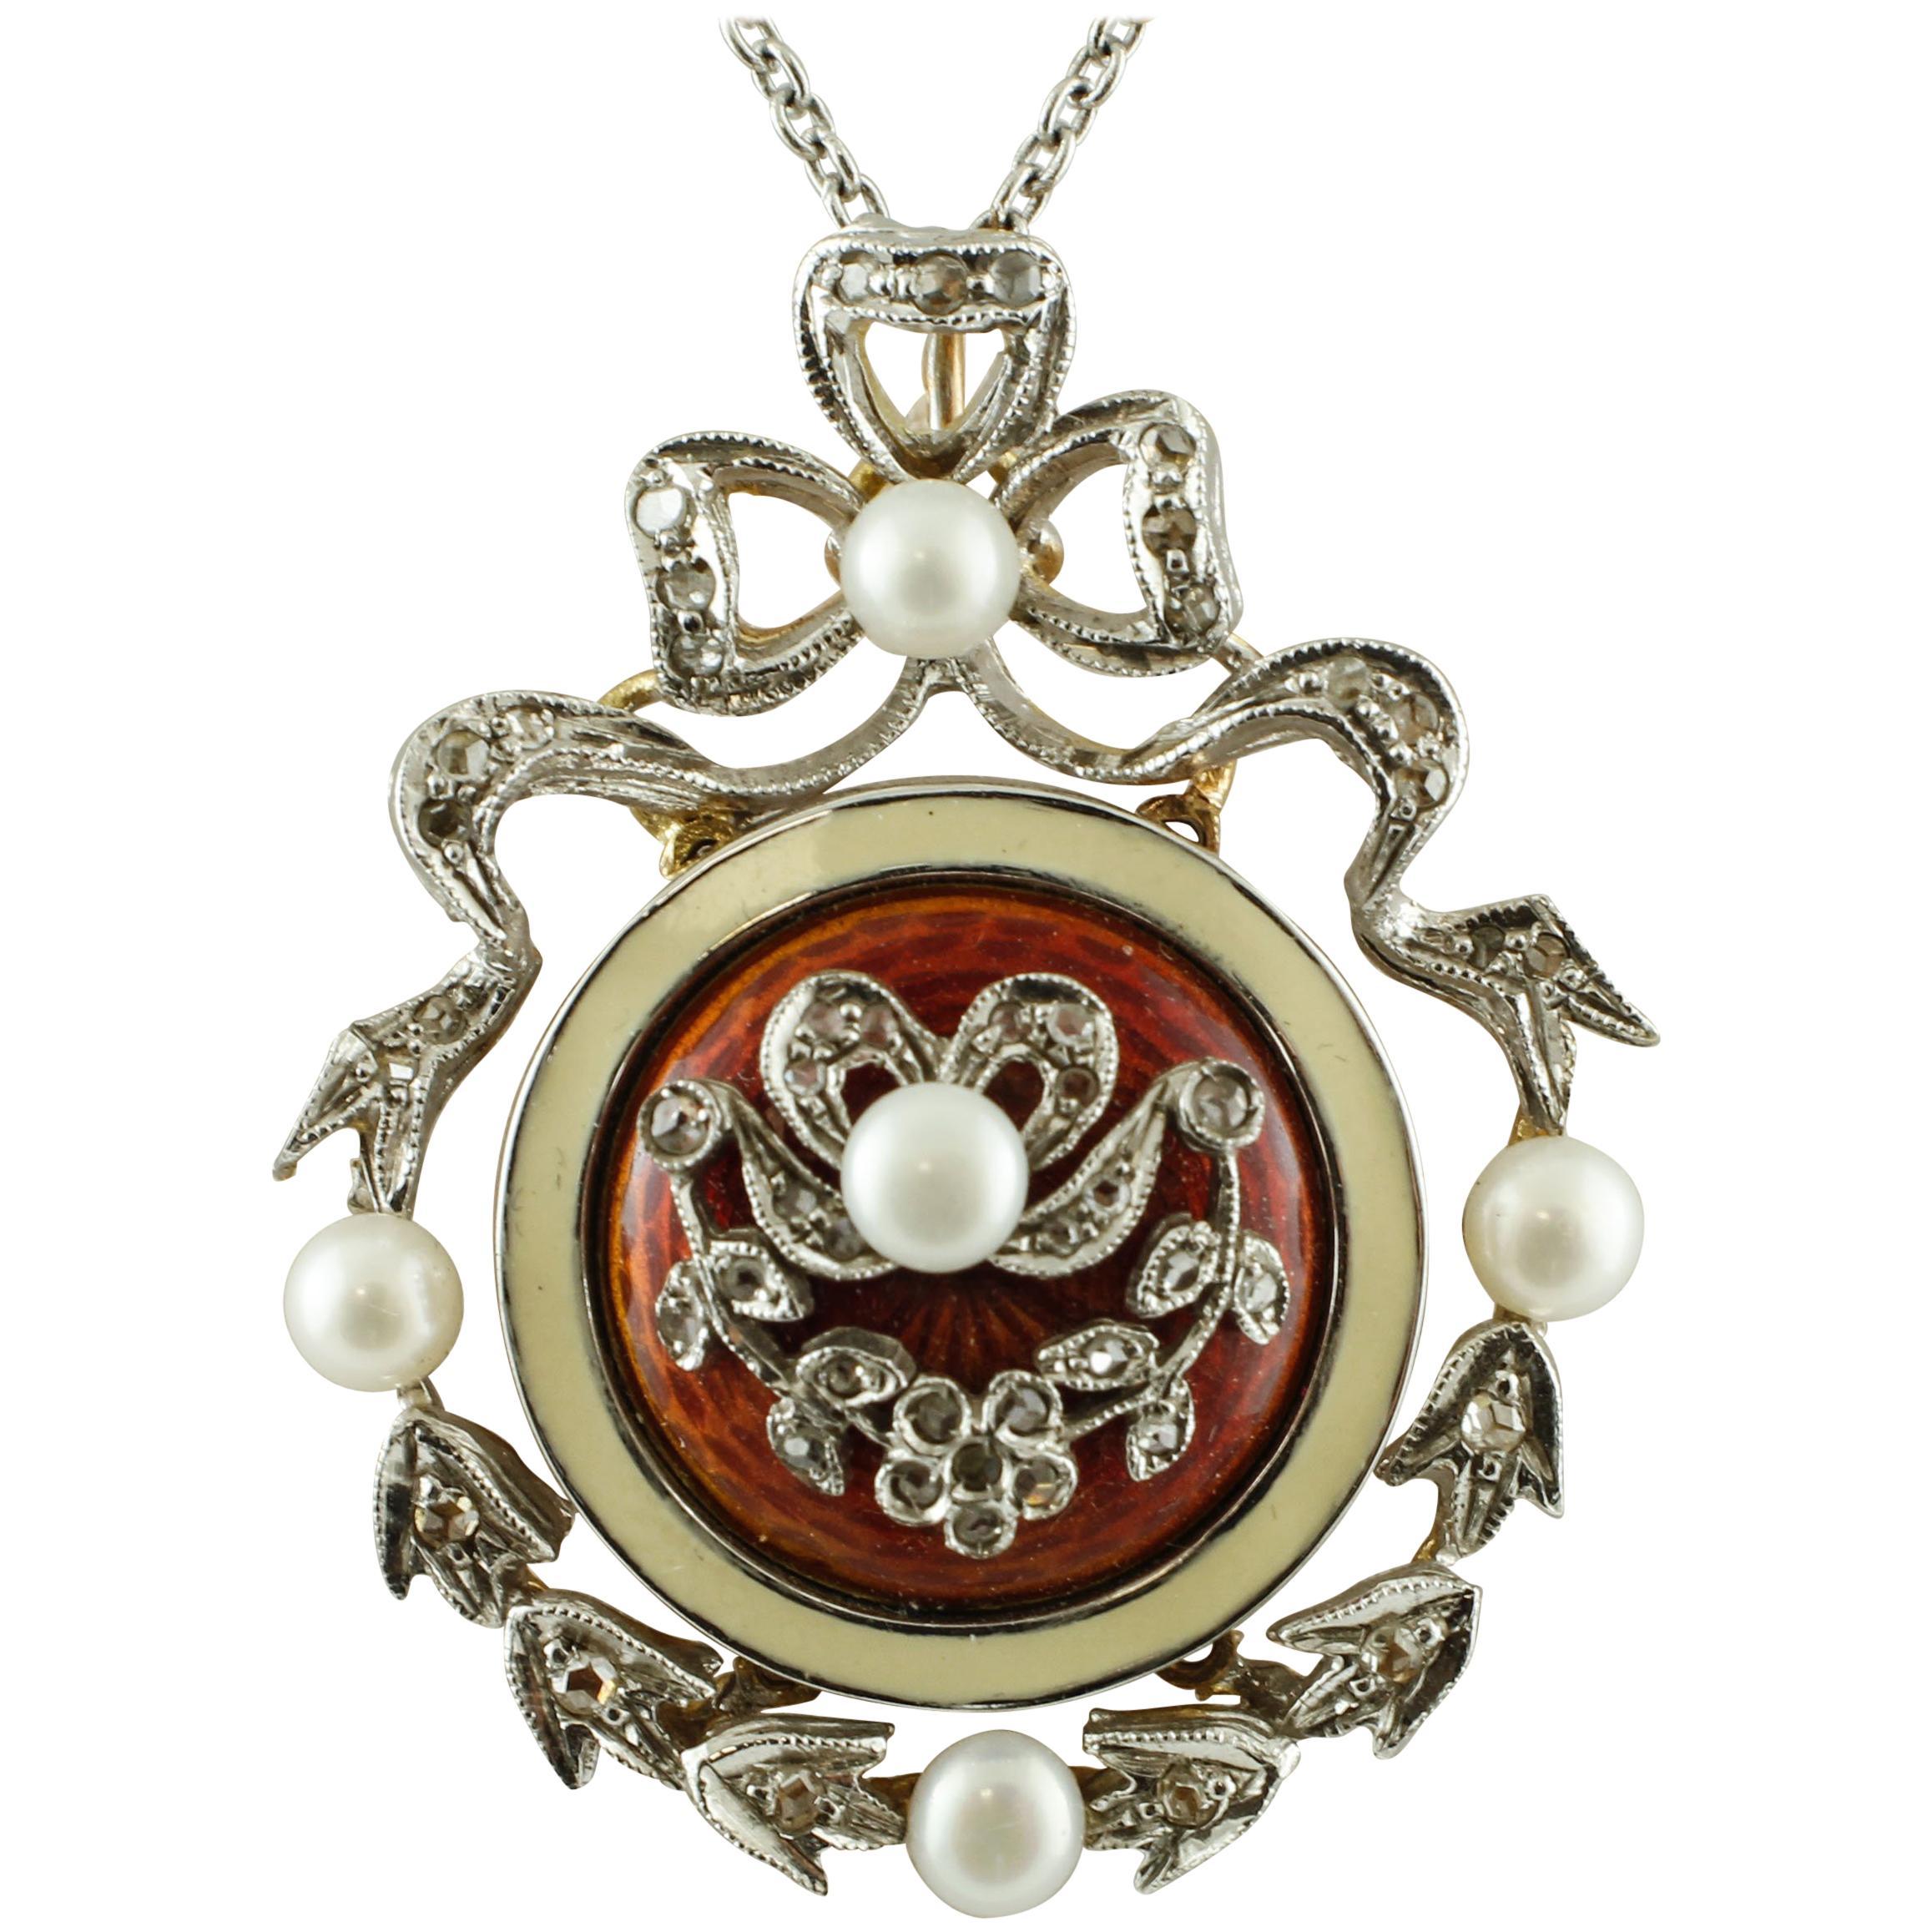 Diamonds, Pearls, 14 Karat White Gold Necklace with Pendant